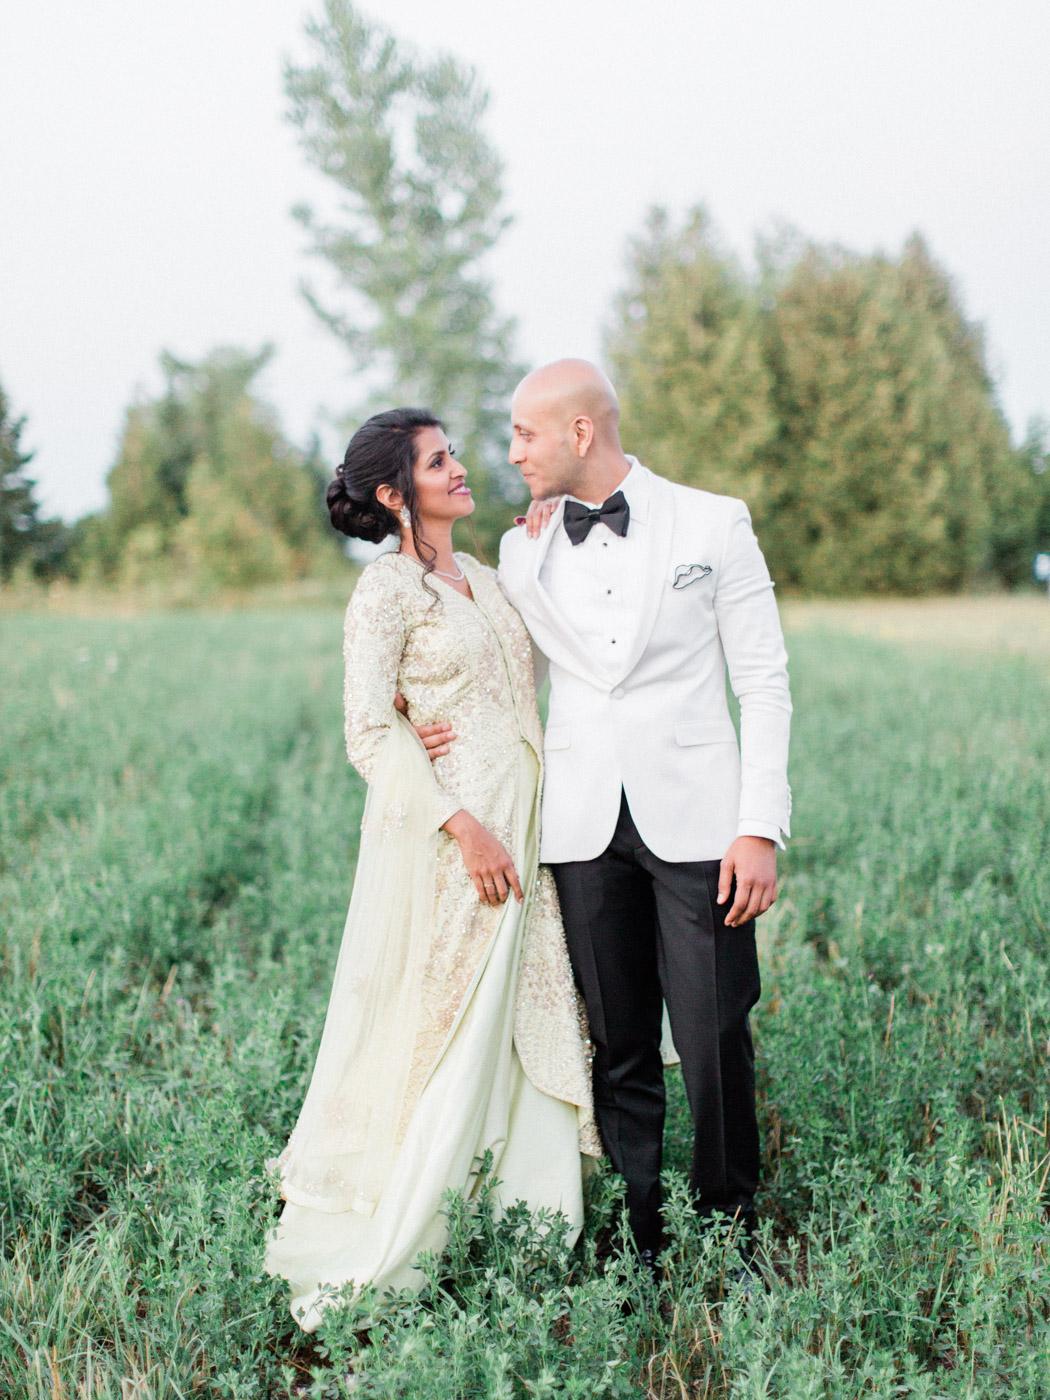 Toronto-Collingwood-wedding-photographer-indian-wedding-documentary180.jpg